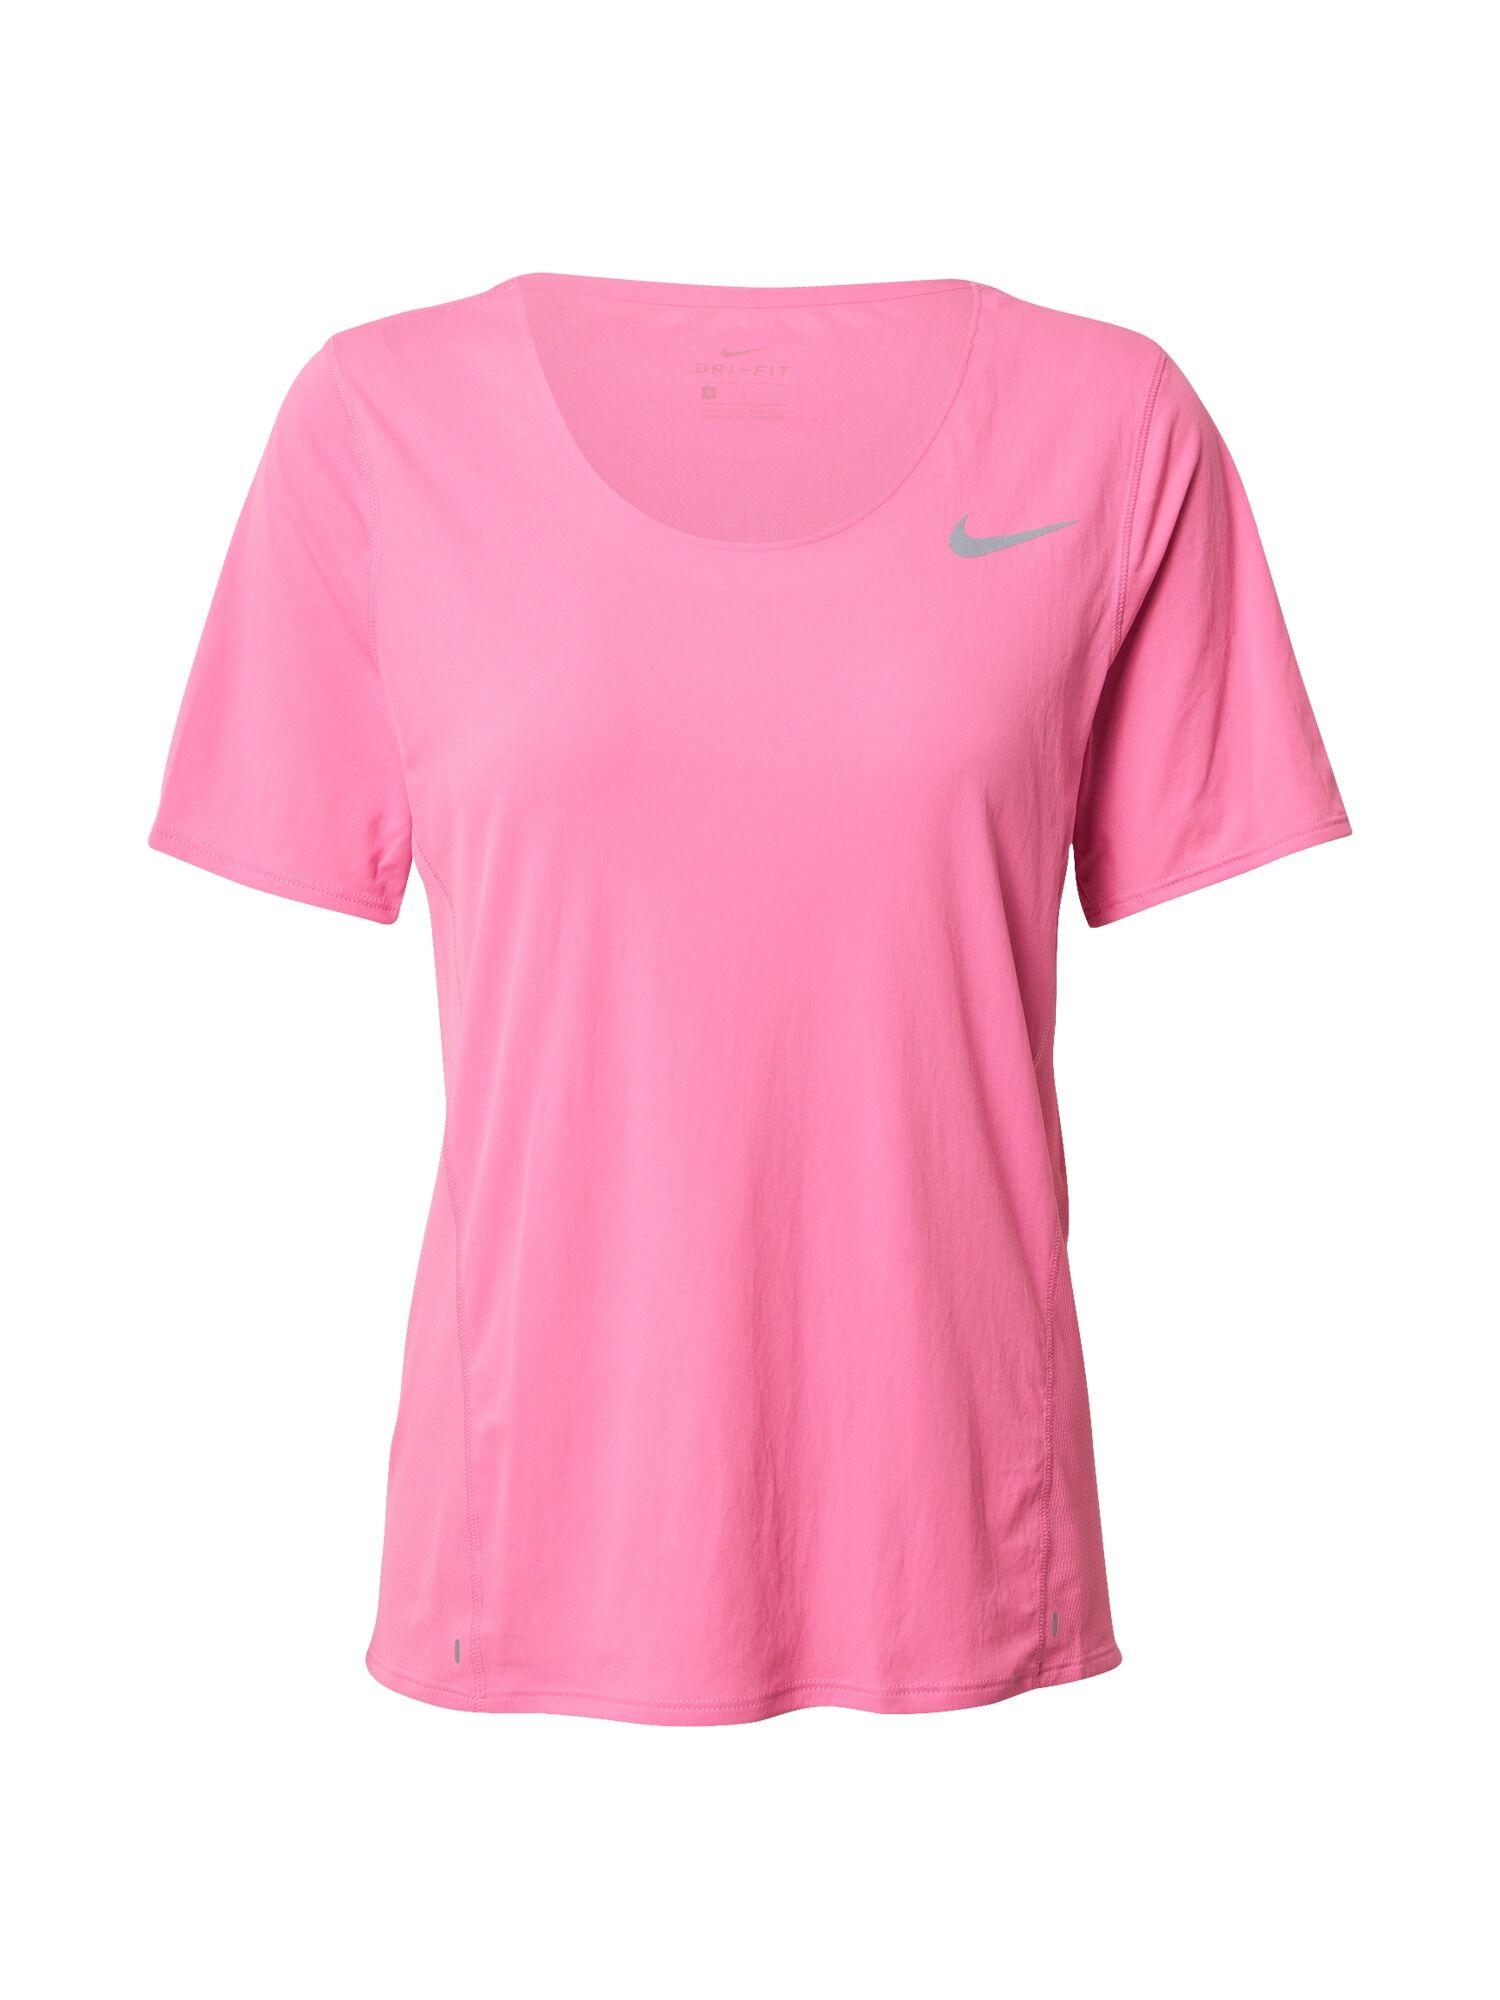 NIKE T-shirt fonctionnel 'City Sleek'  - Rose - Taille: L - female